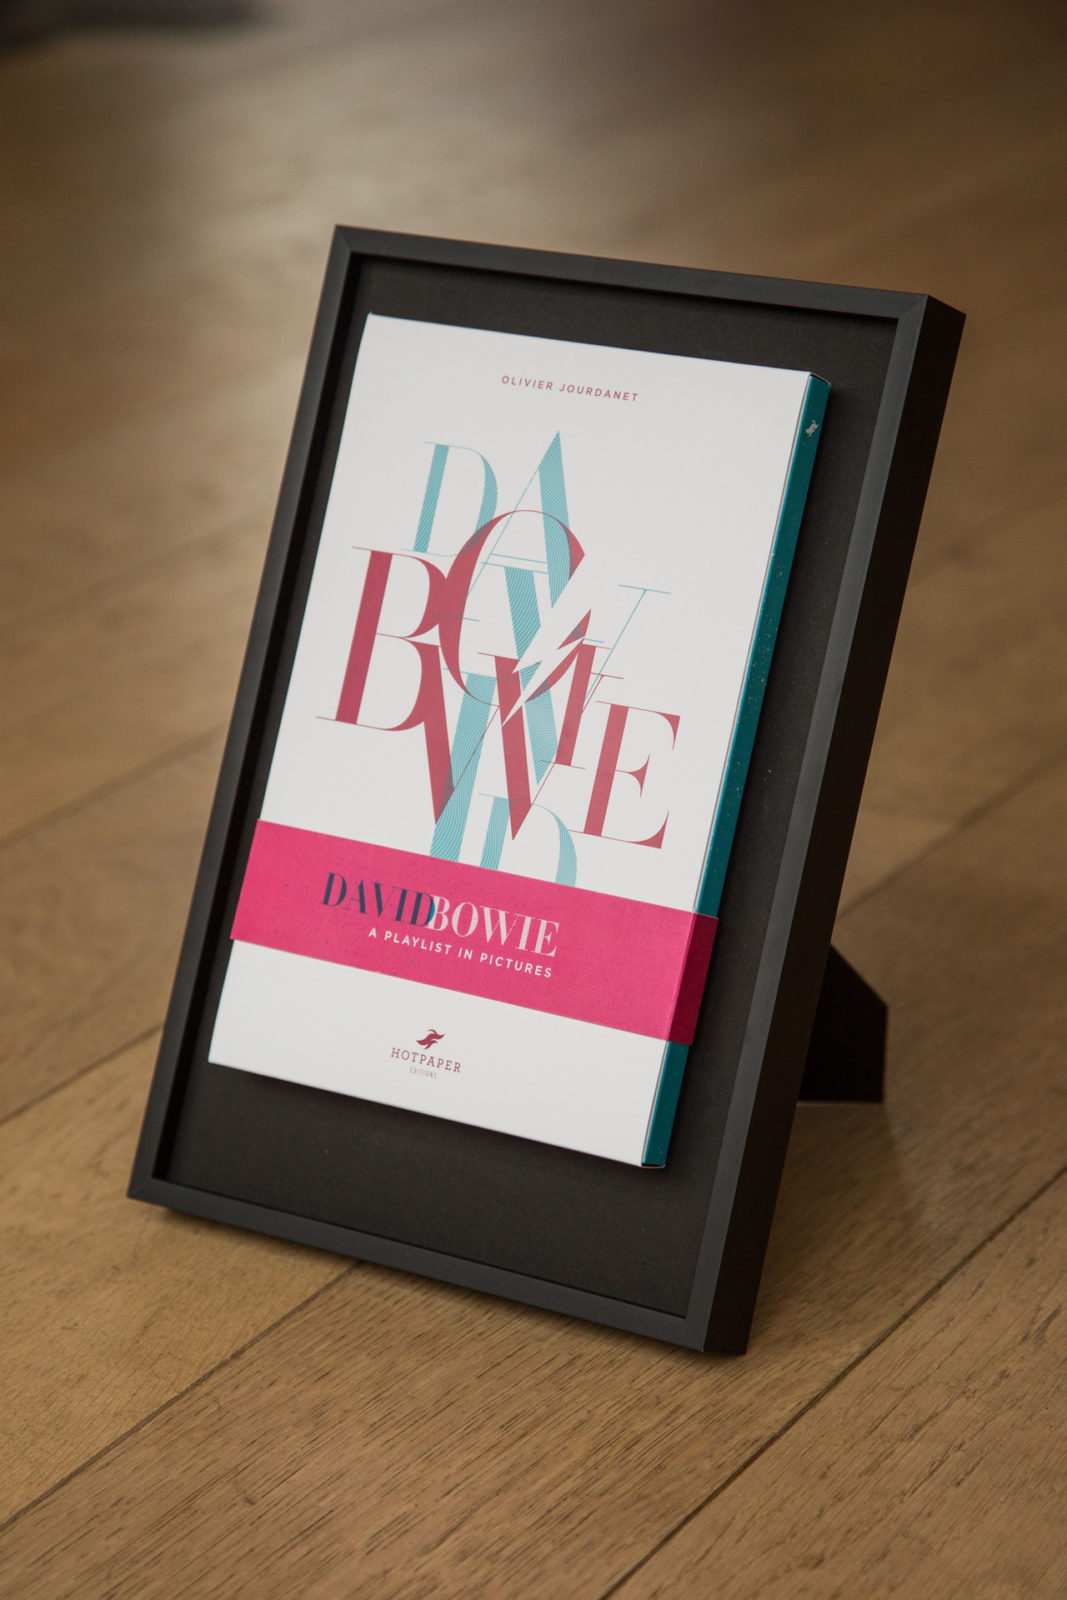 HPE-David-Bowie-Letterpress-Box-Frame